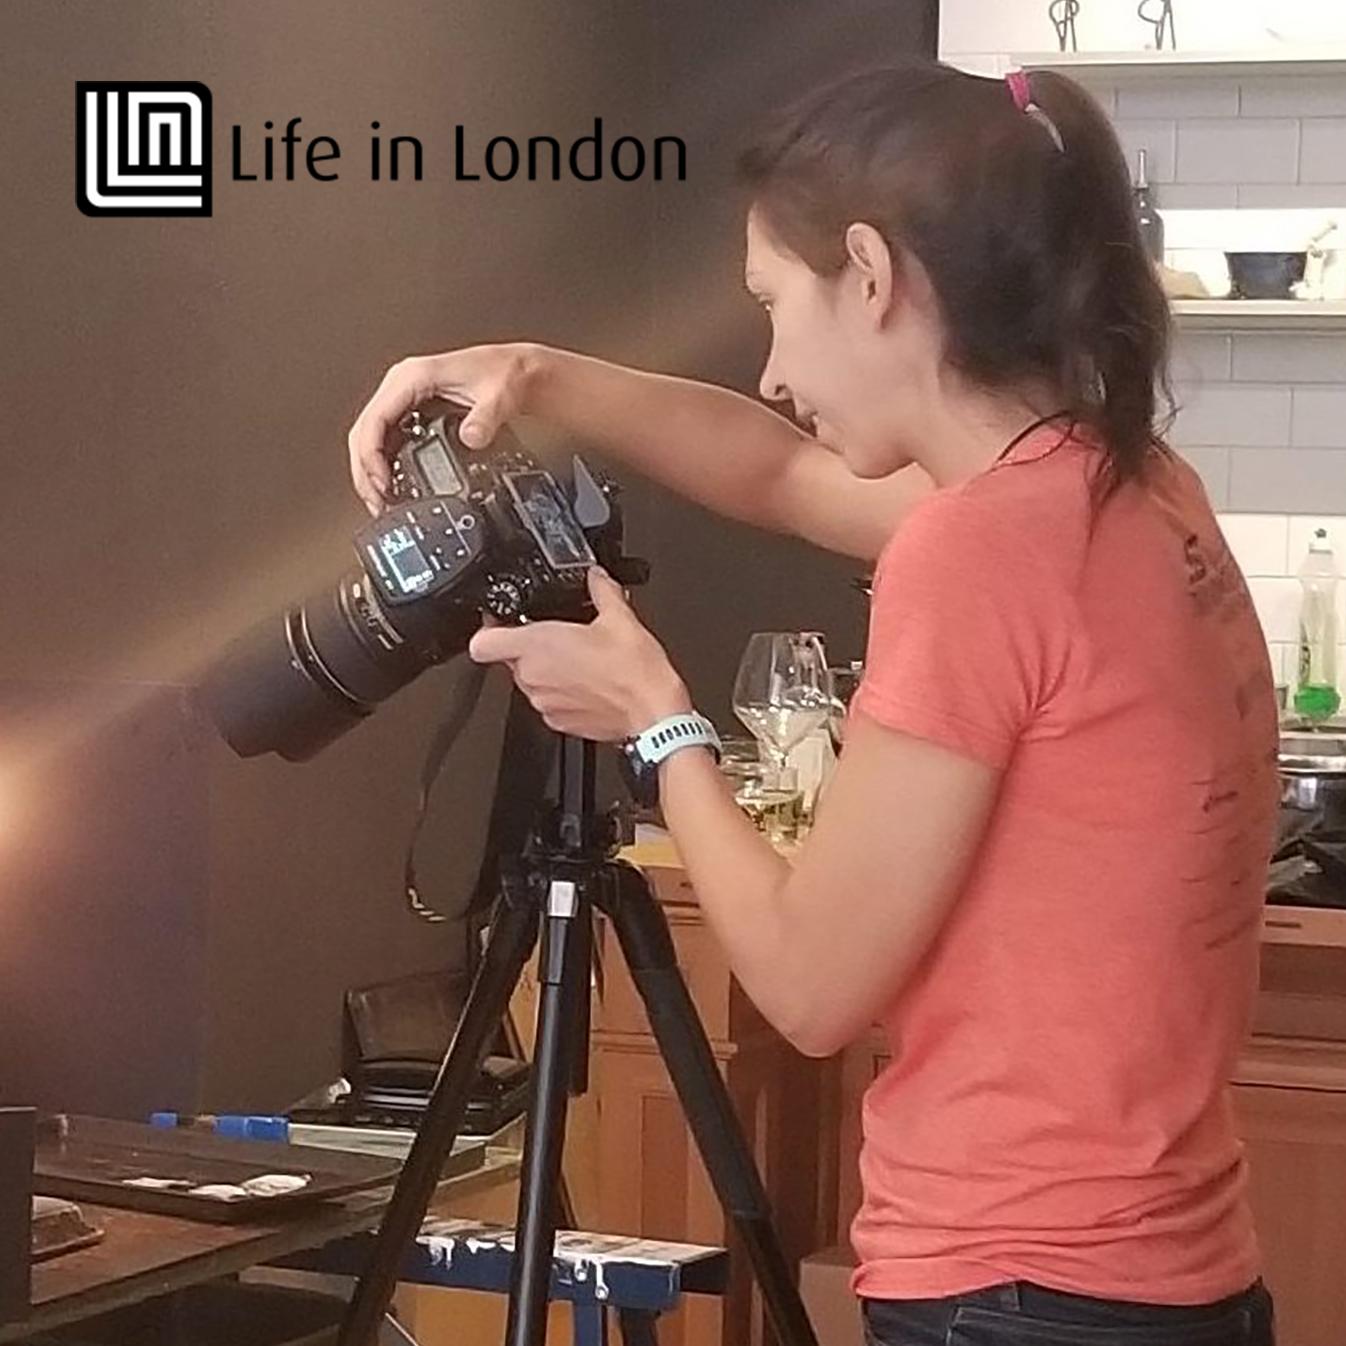 life in London 2.jpg